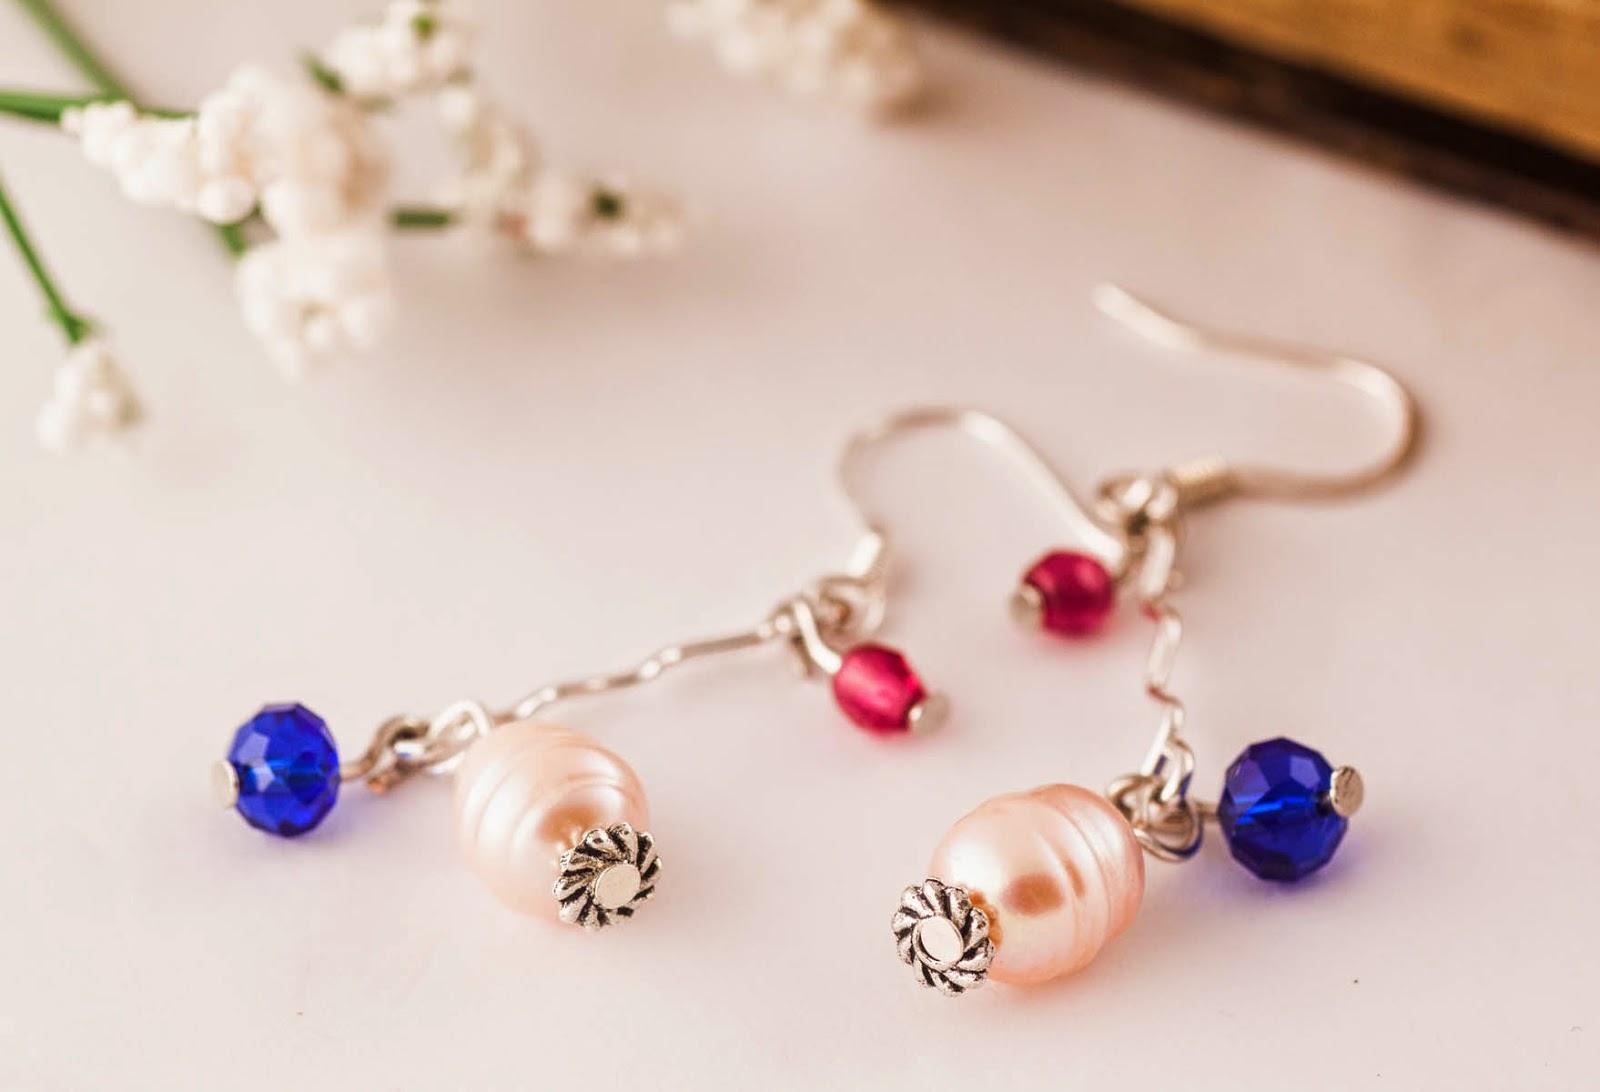 http://www.pinkbijou.com/index.php/pendientes-perla-y-cristal/